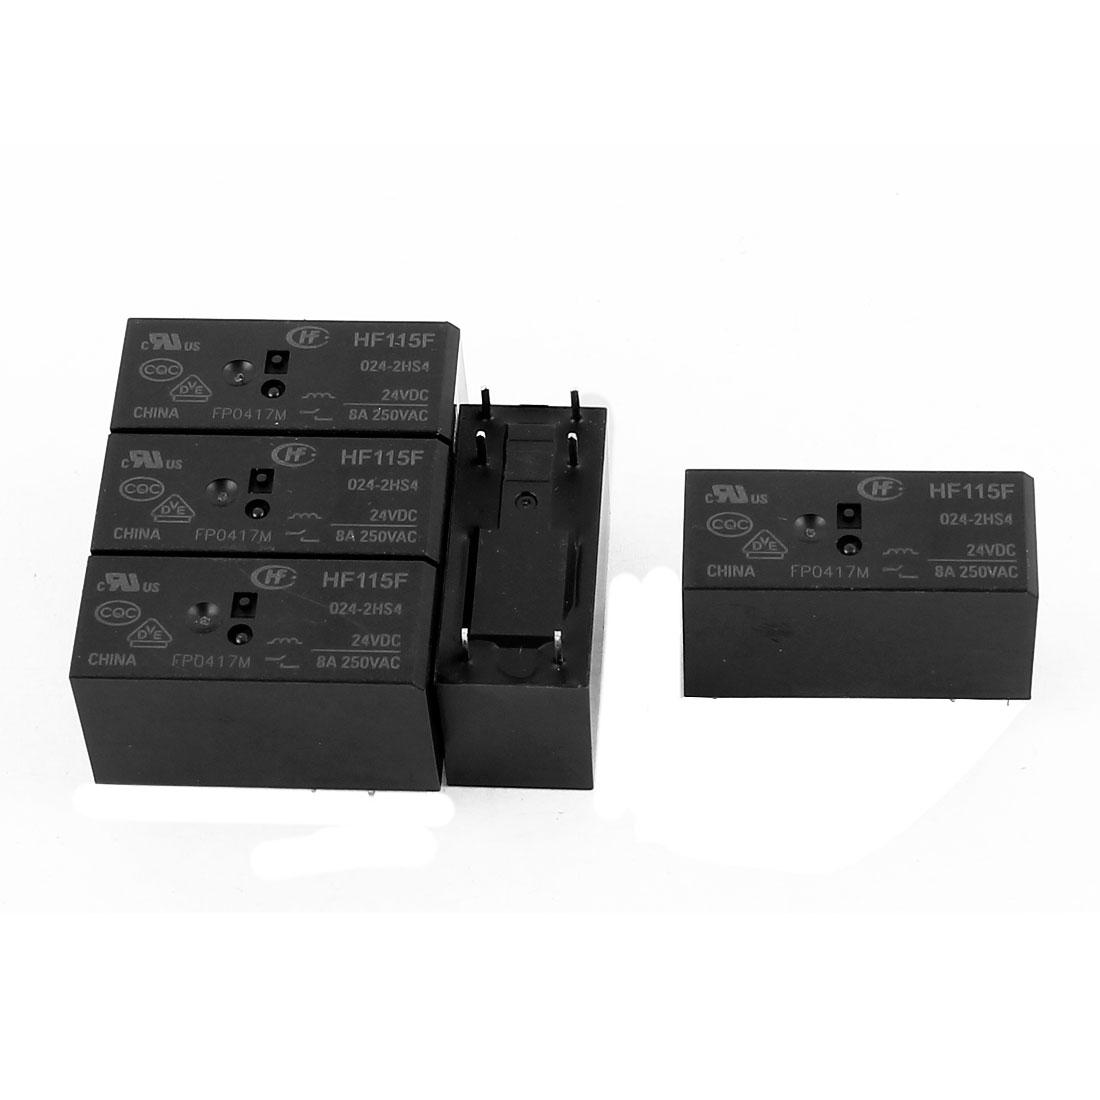 5 Pcs 24VDC 250VAC 8A 4 Terminal DPST Dual NO HF-115F-024-2HS4 Power Relay